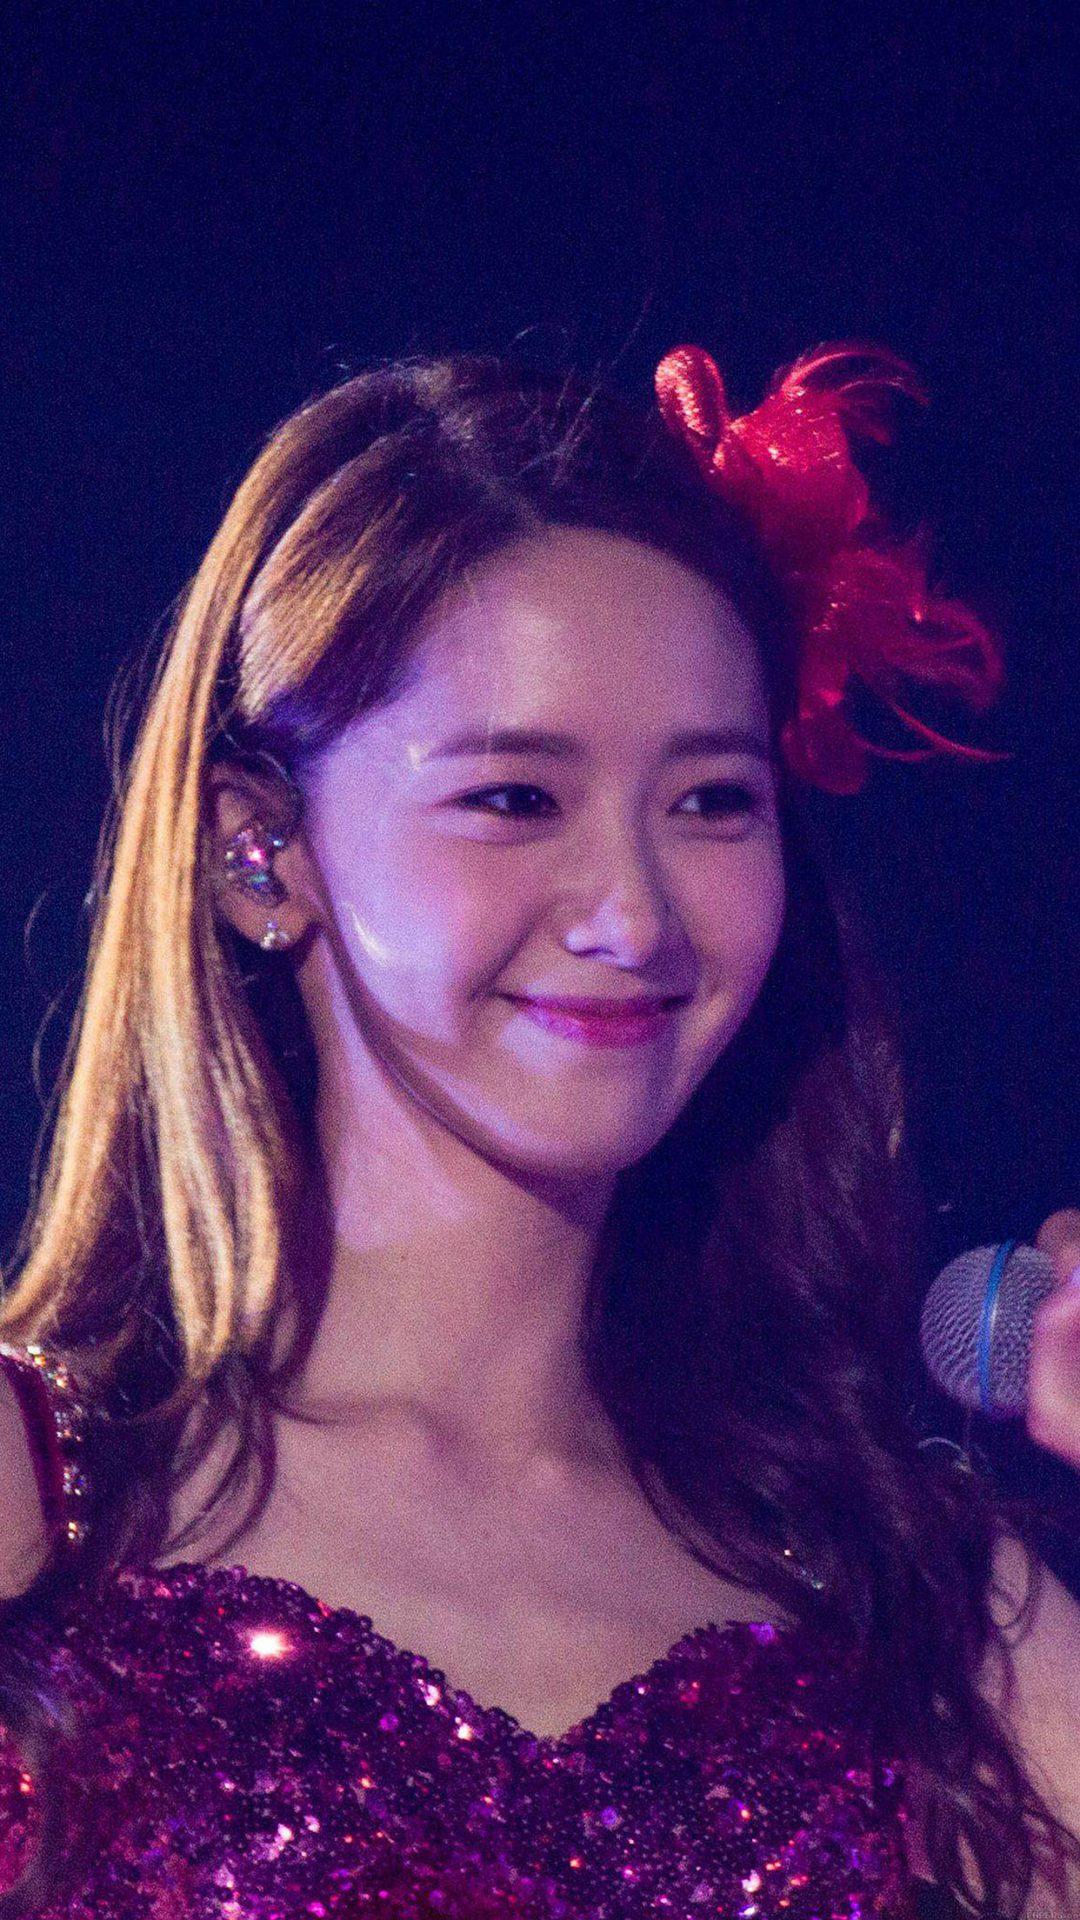 Yuna Snsd Face Music Kpop Girl Art